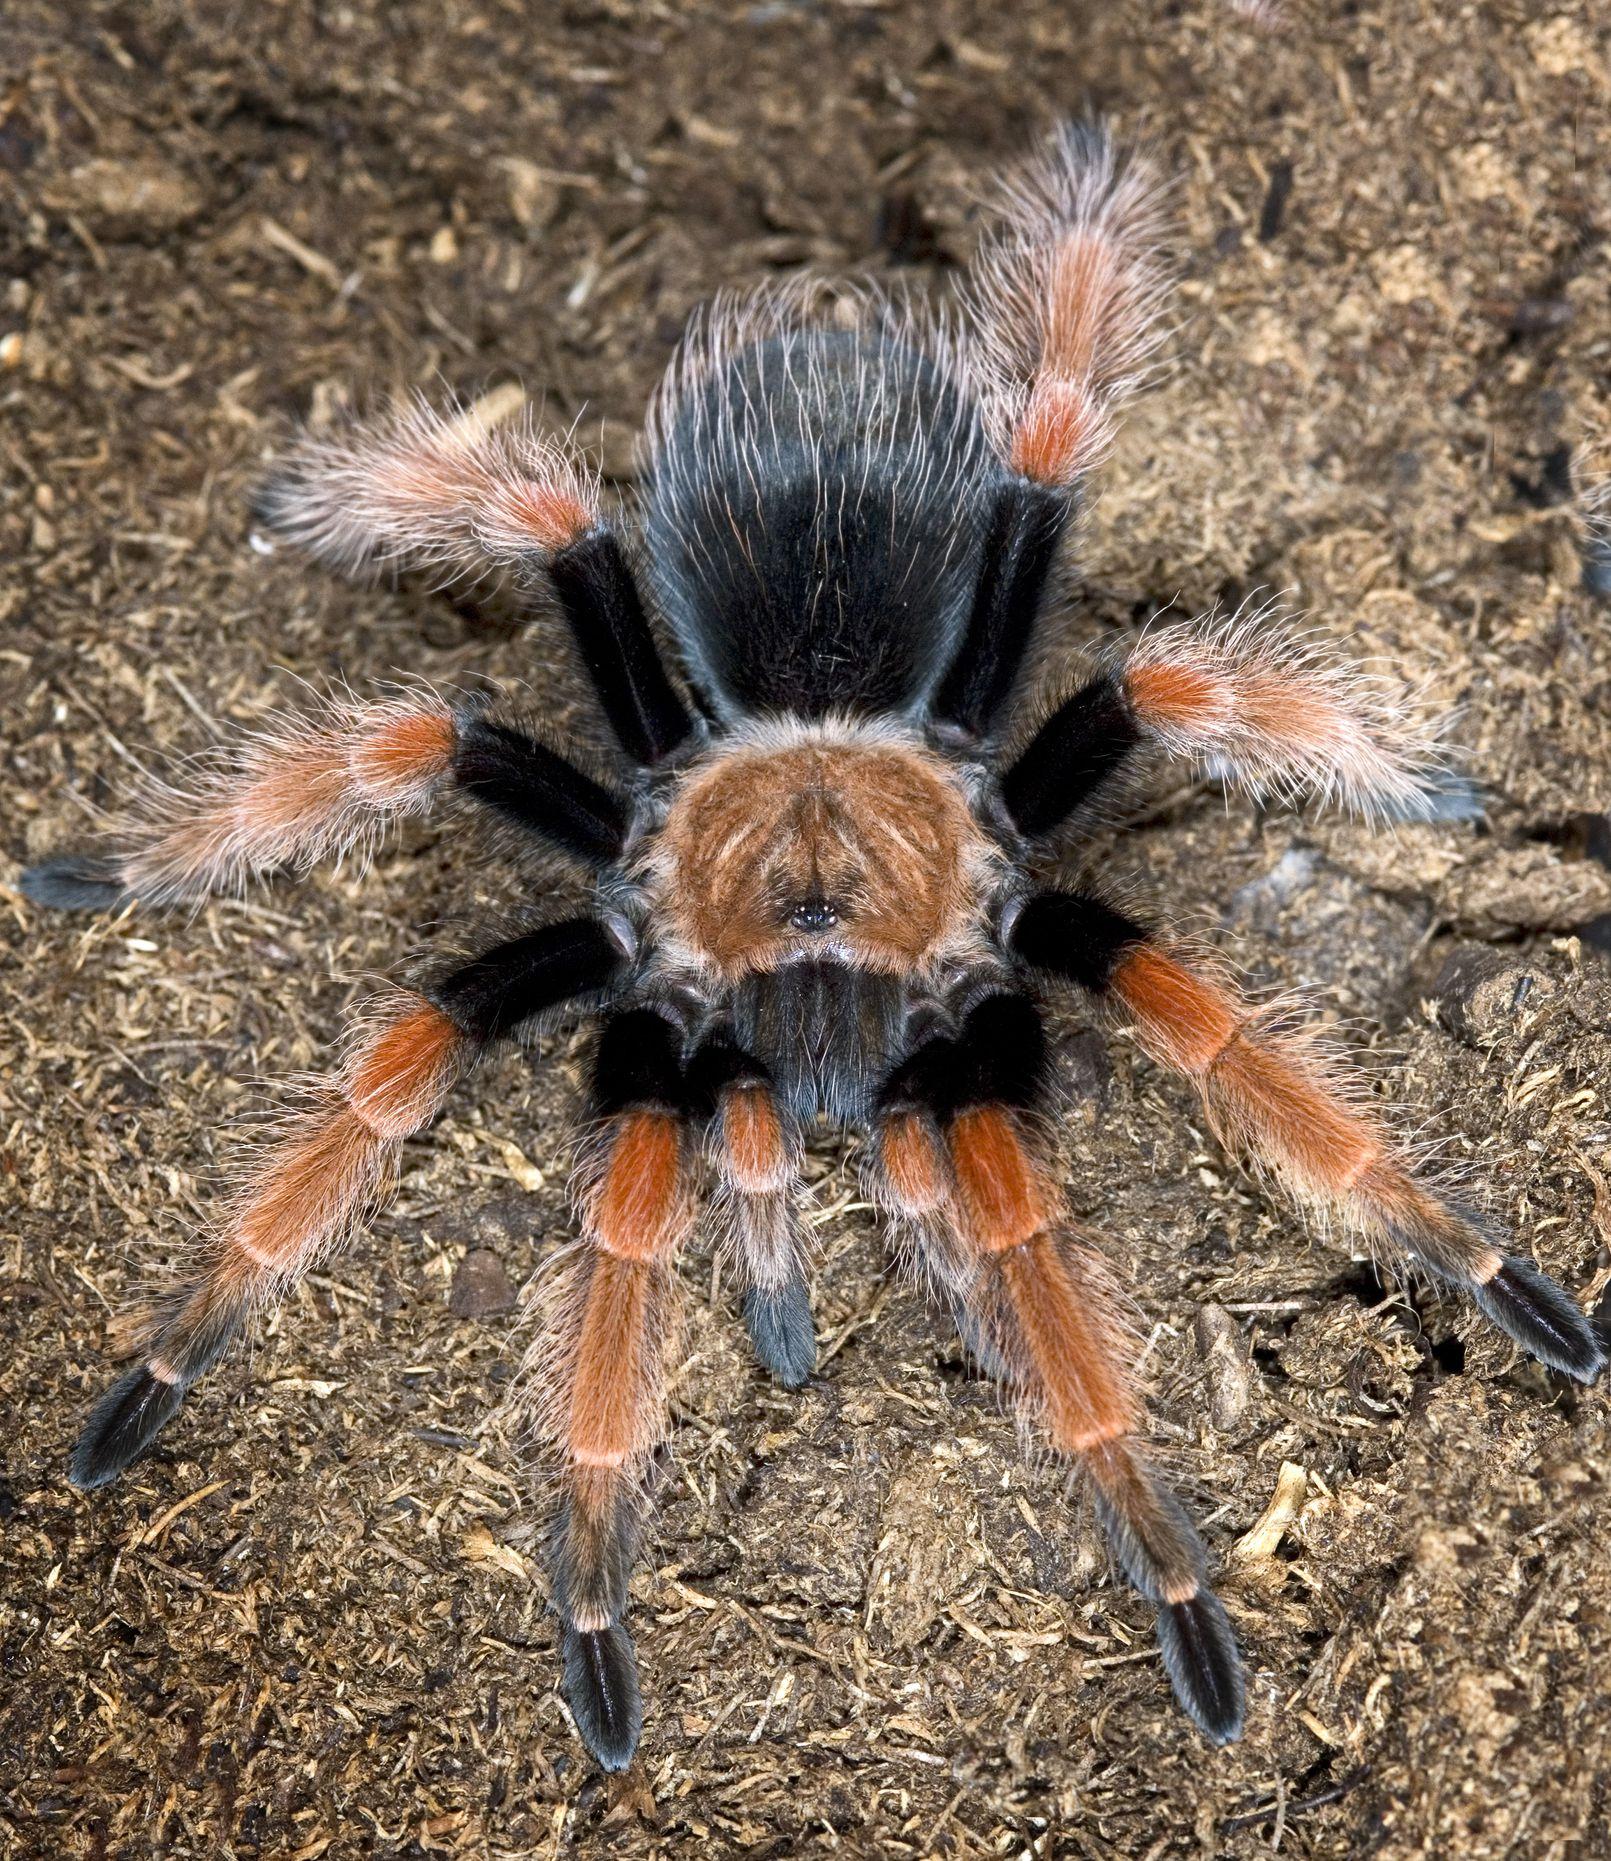 Mexican redleg tarantula on mulch